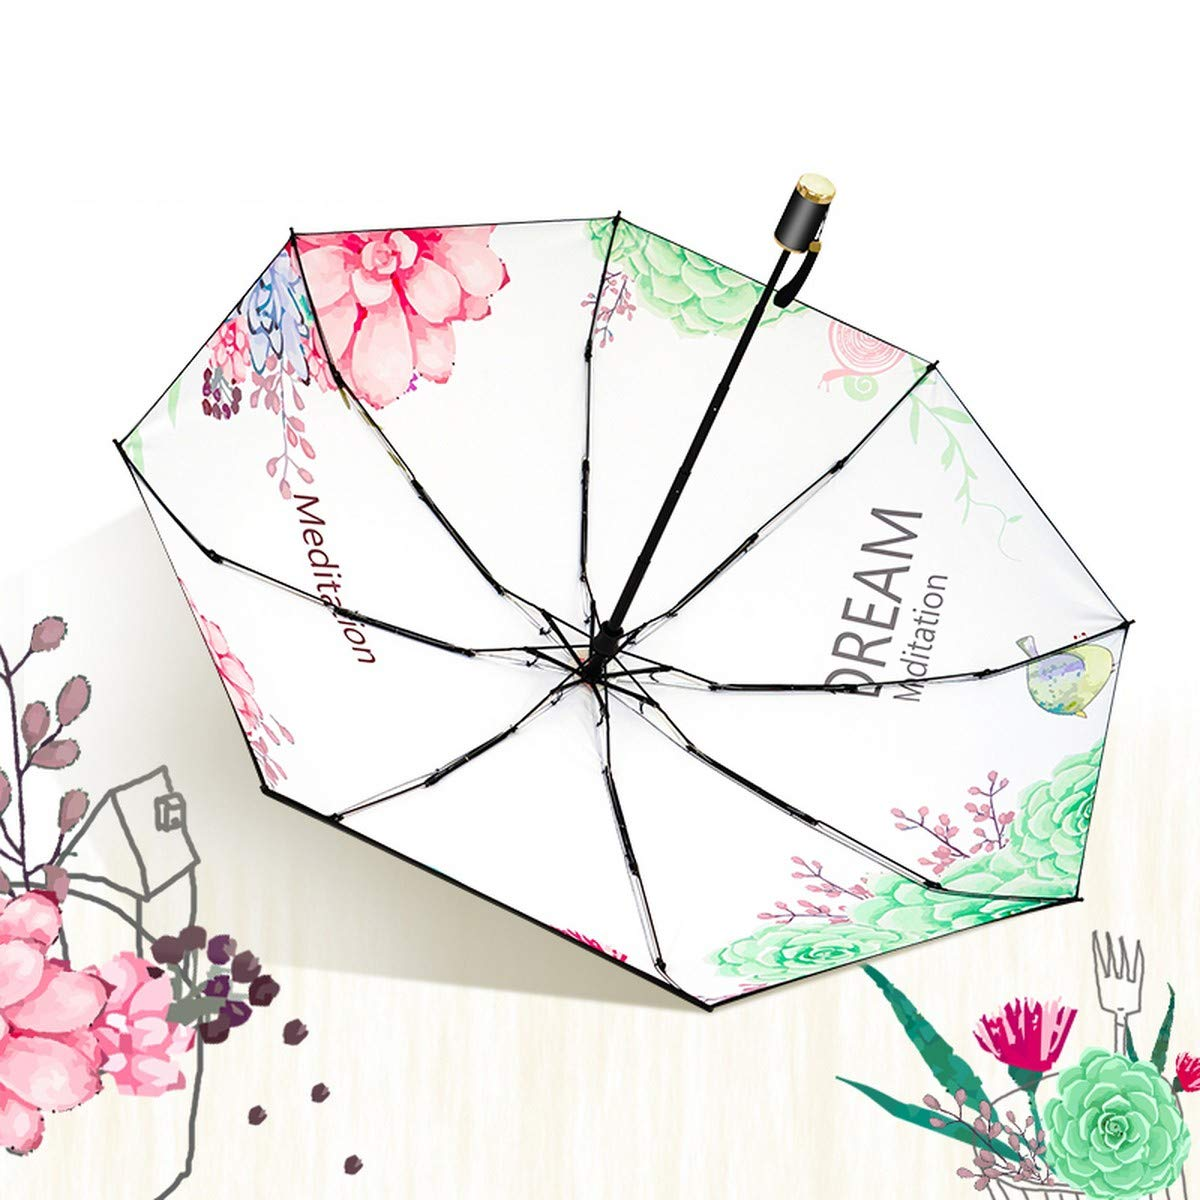 YSKGZ Paraguas Paraguas De Tres Pliegues Y Lluvia.Paraguas Protector Solar Uso.Regalo De Doble Uso.Regalo Solar Femenino,Verde. f8e3a2